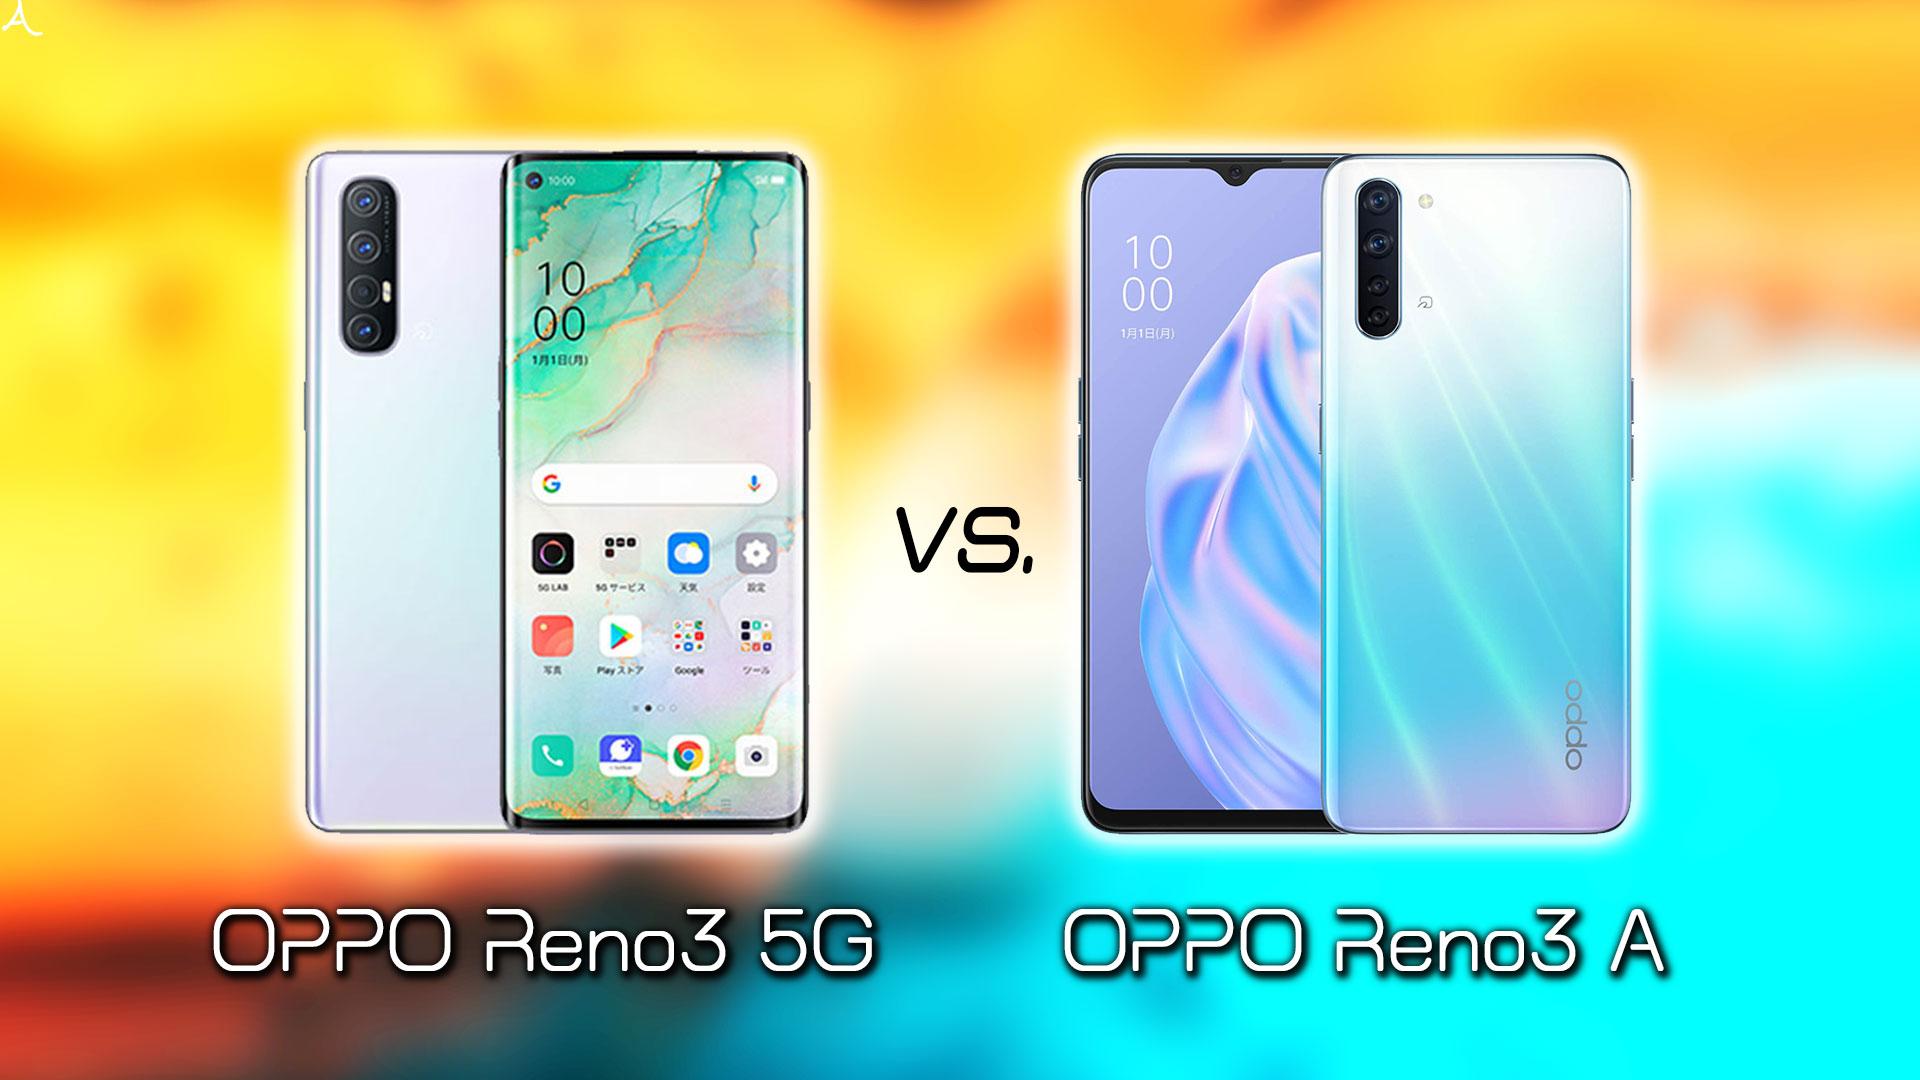 「OPPO Reno3 5G」と「OPPO Reno3 A」のスペックや違いを細かく比較